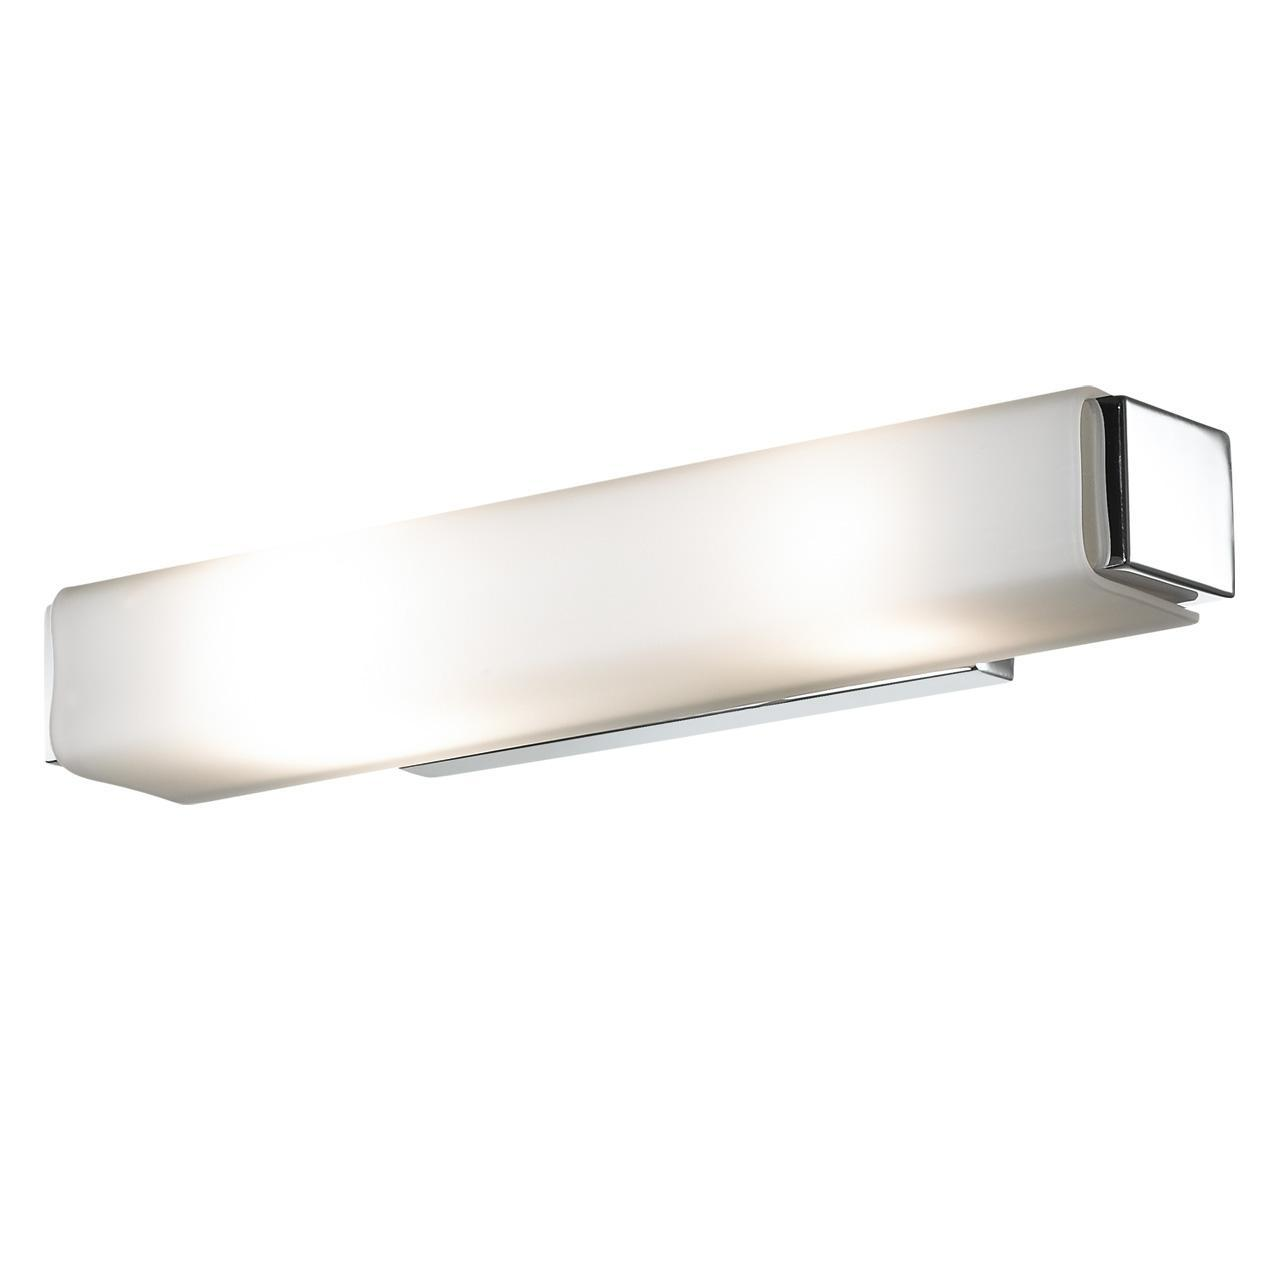 Настенный светильник Odeon Light Kima 2731/2W odeon light 1284 2w